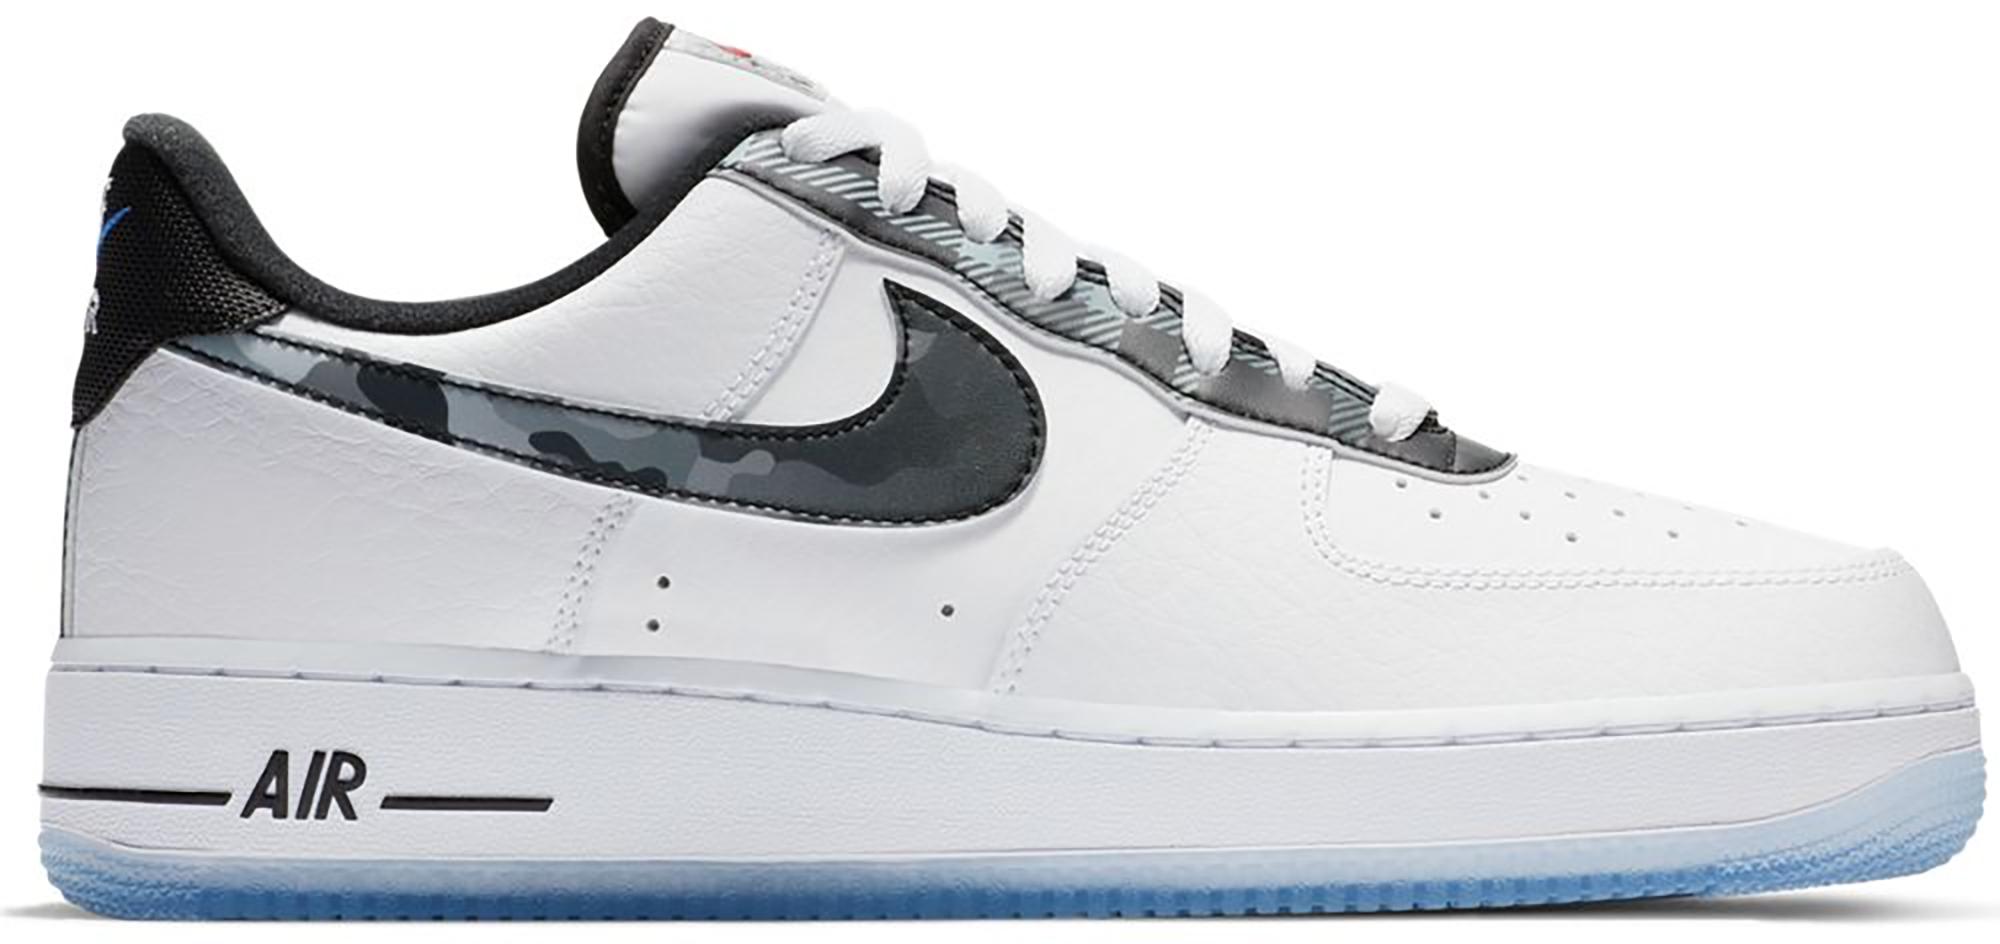 Nike Air Force 1 Low Remix White